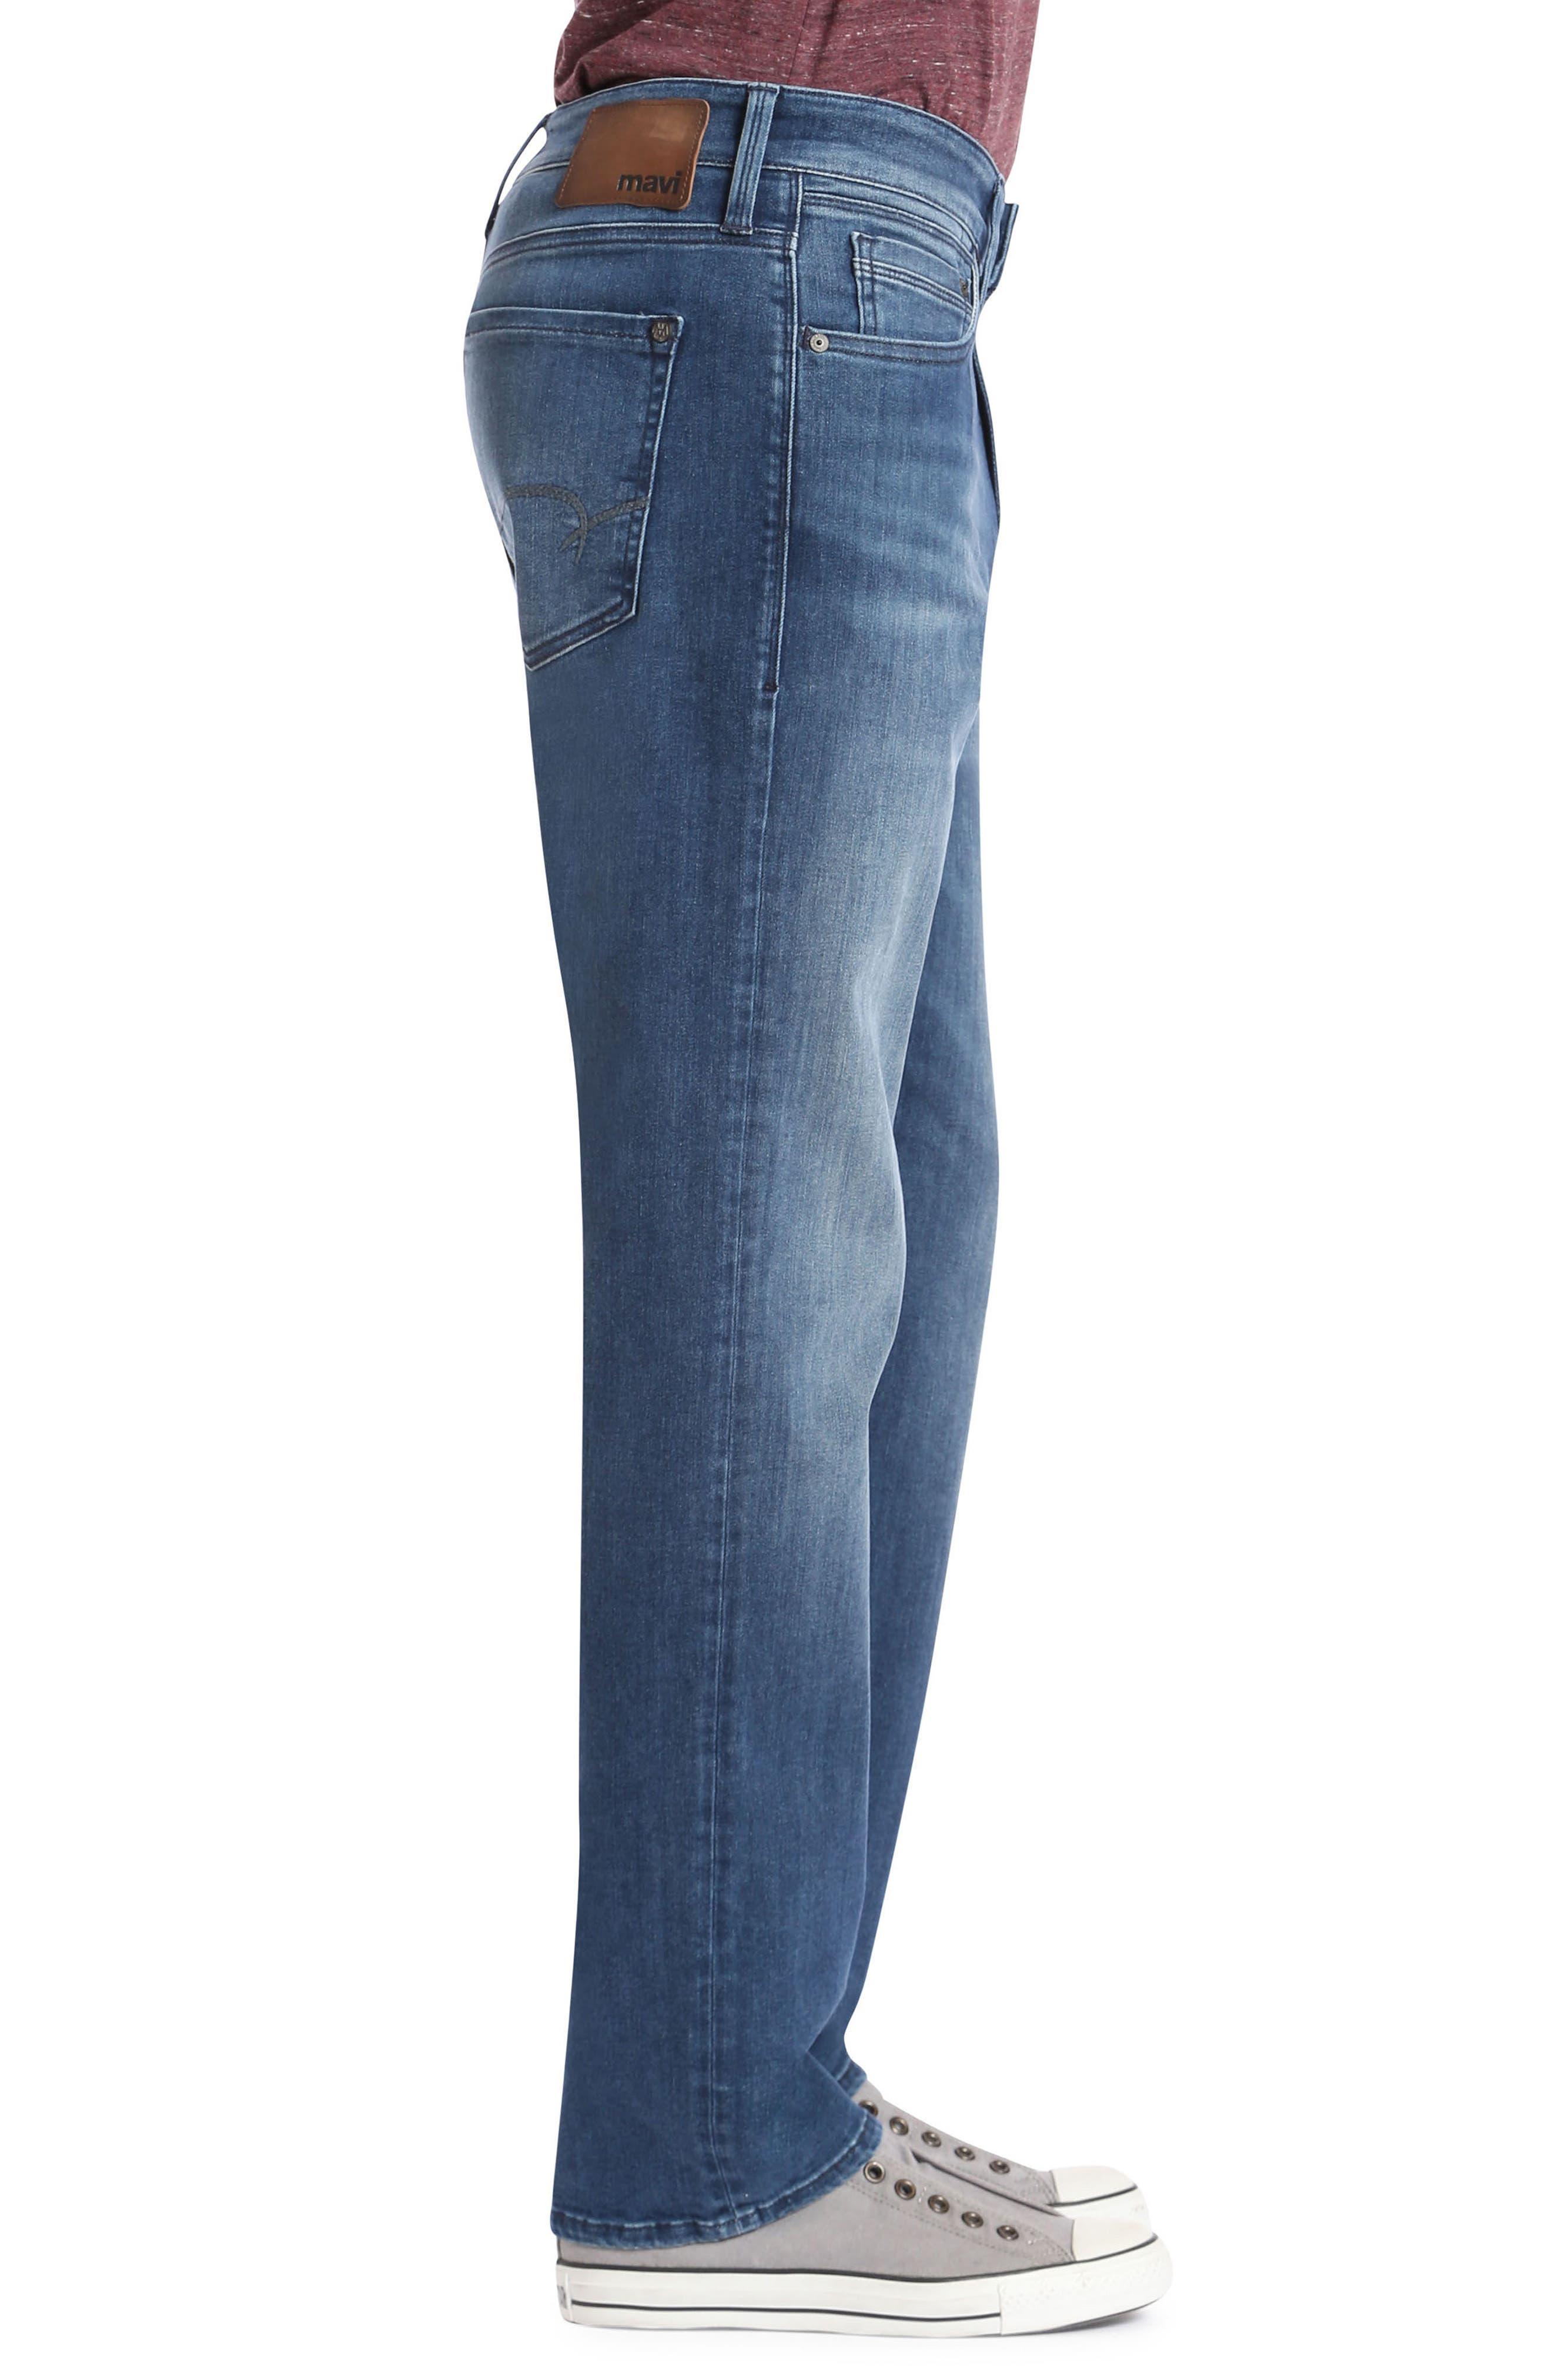 Myles Straight Leg Jeans,                             Alternate thumbnail 3, color,                             400